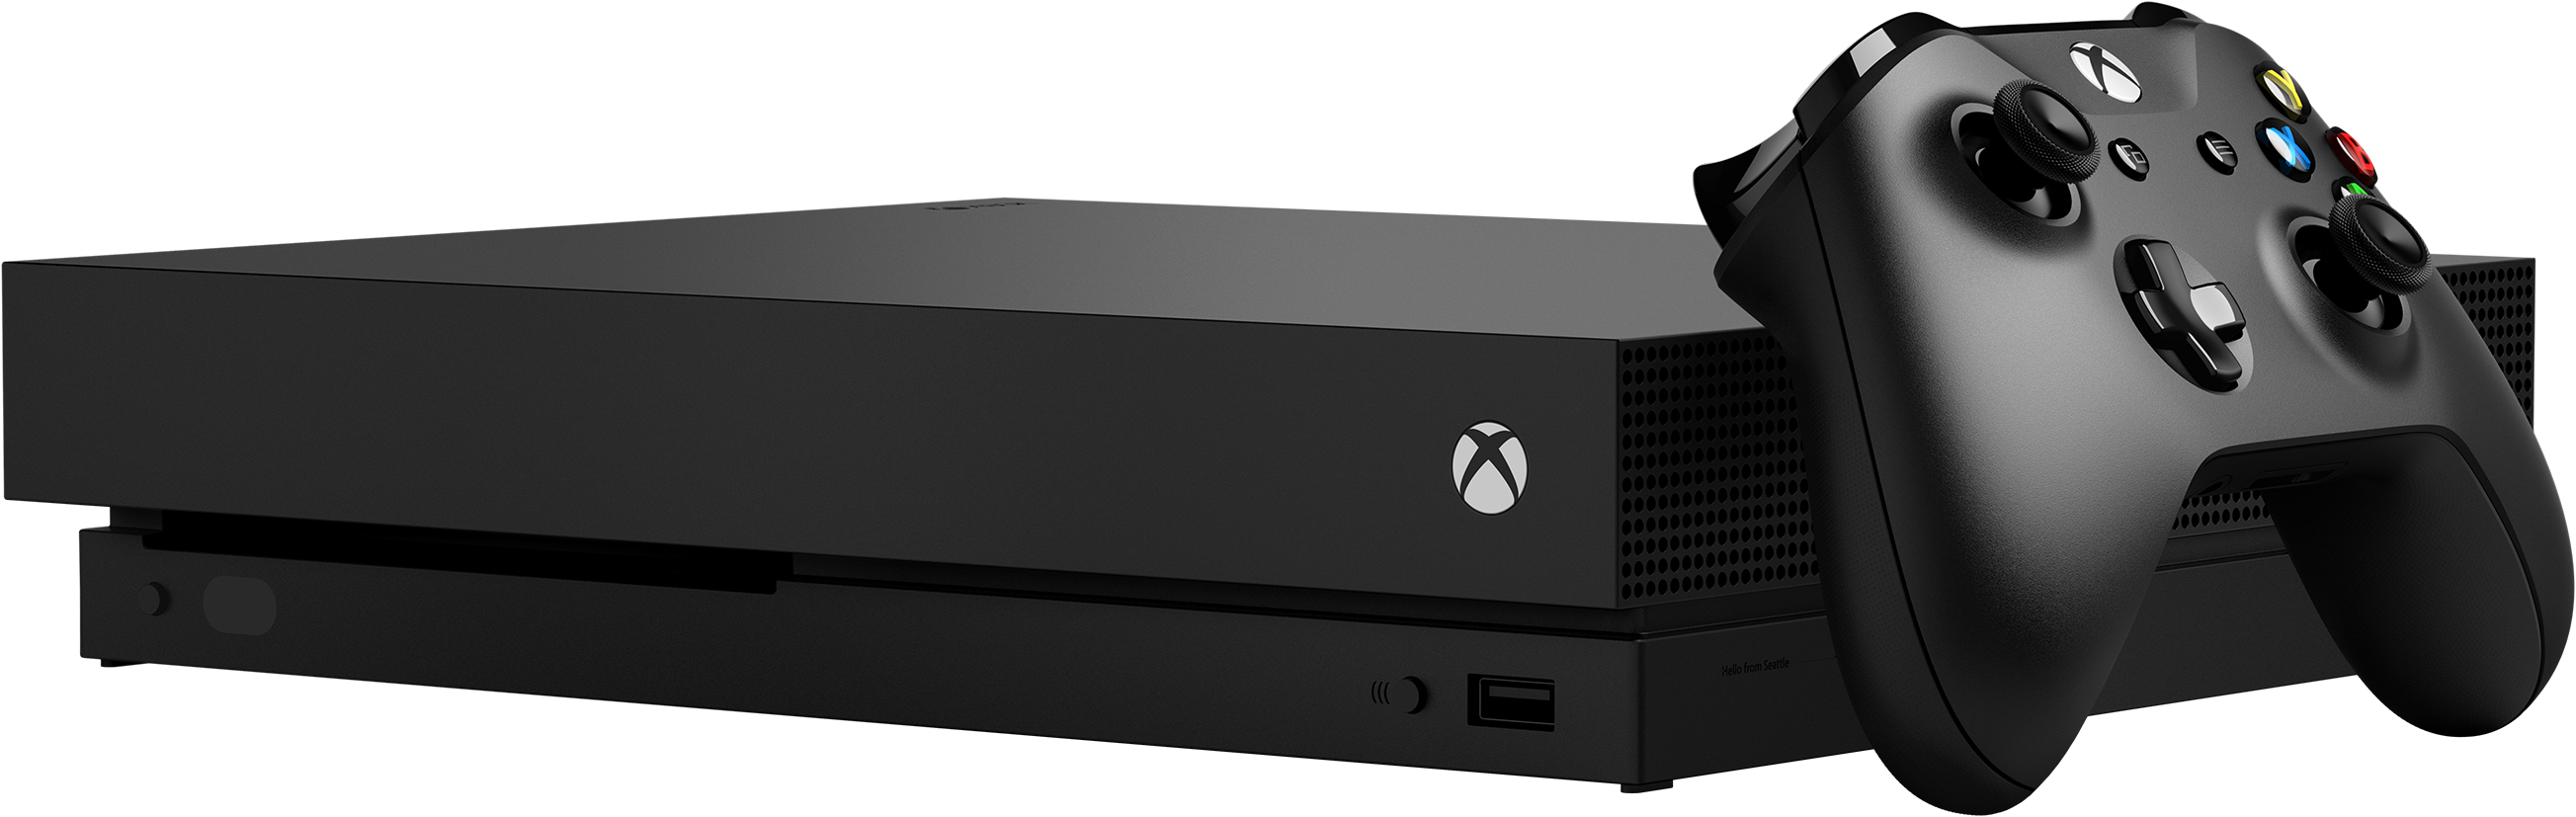 xbox-one-x-1tb-console